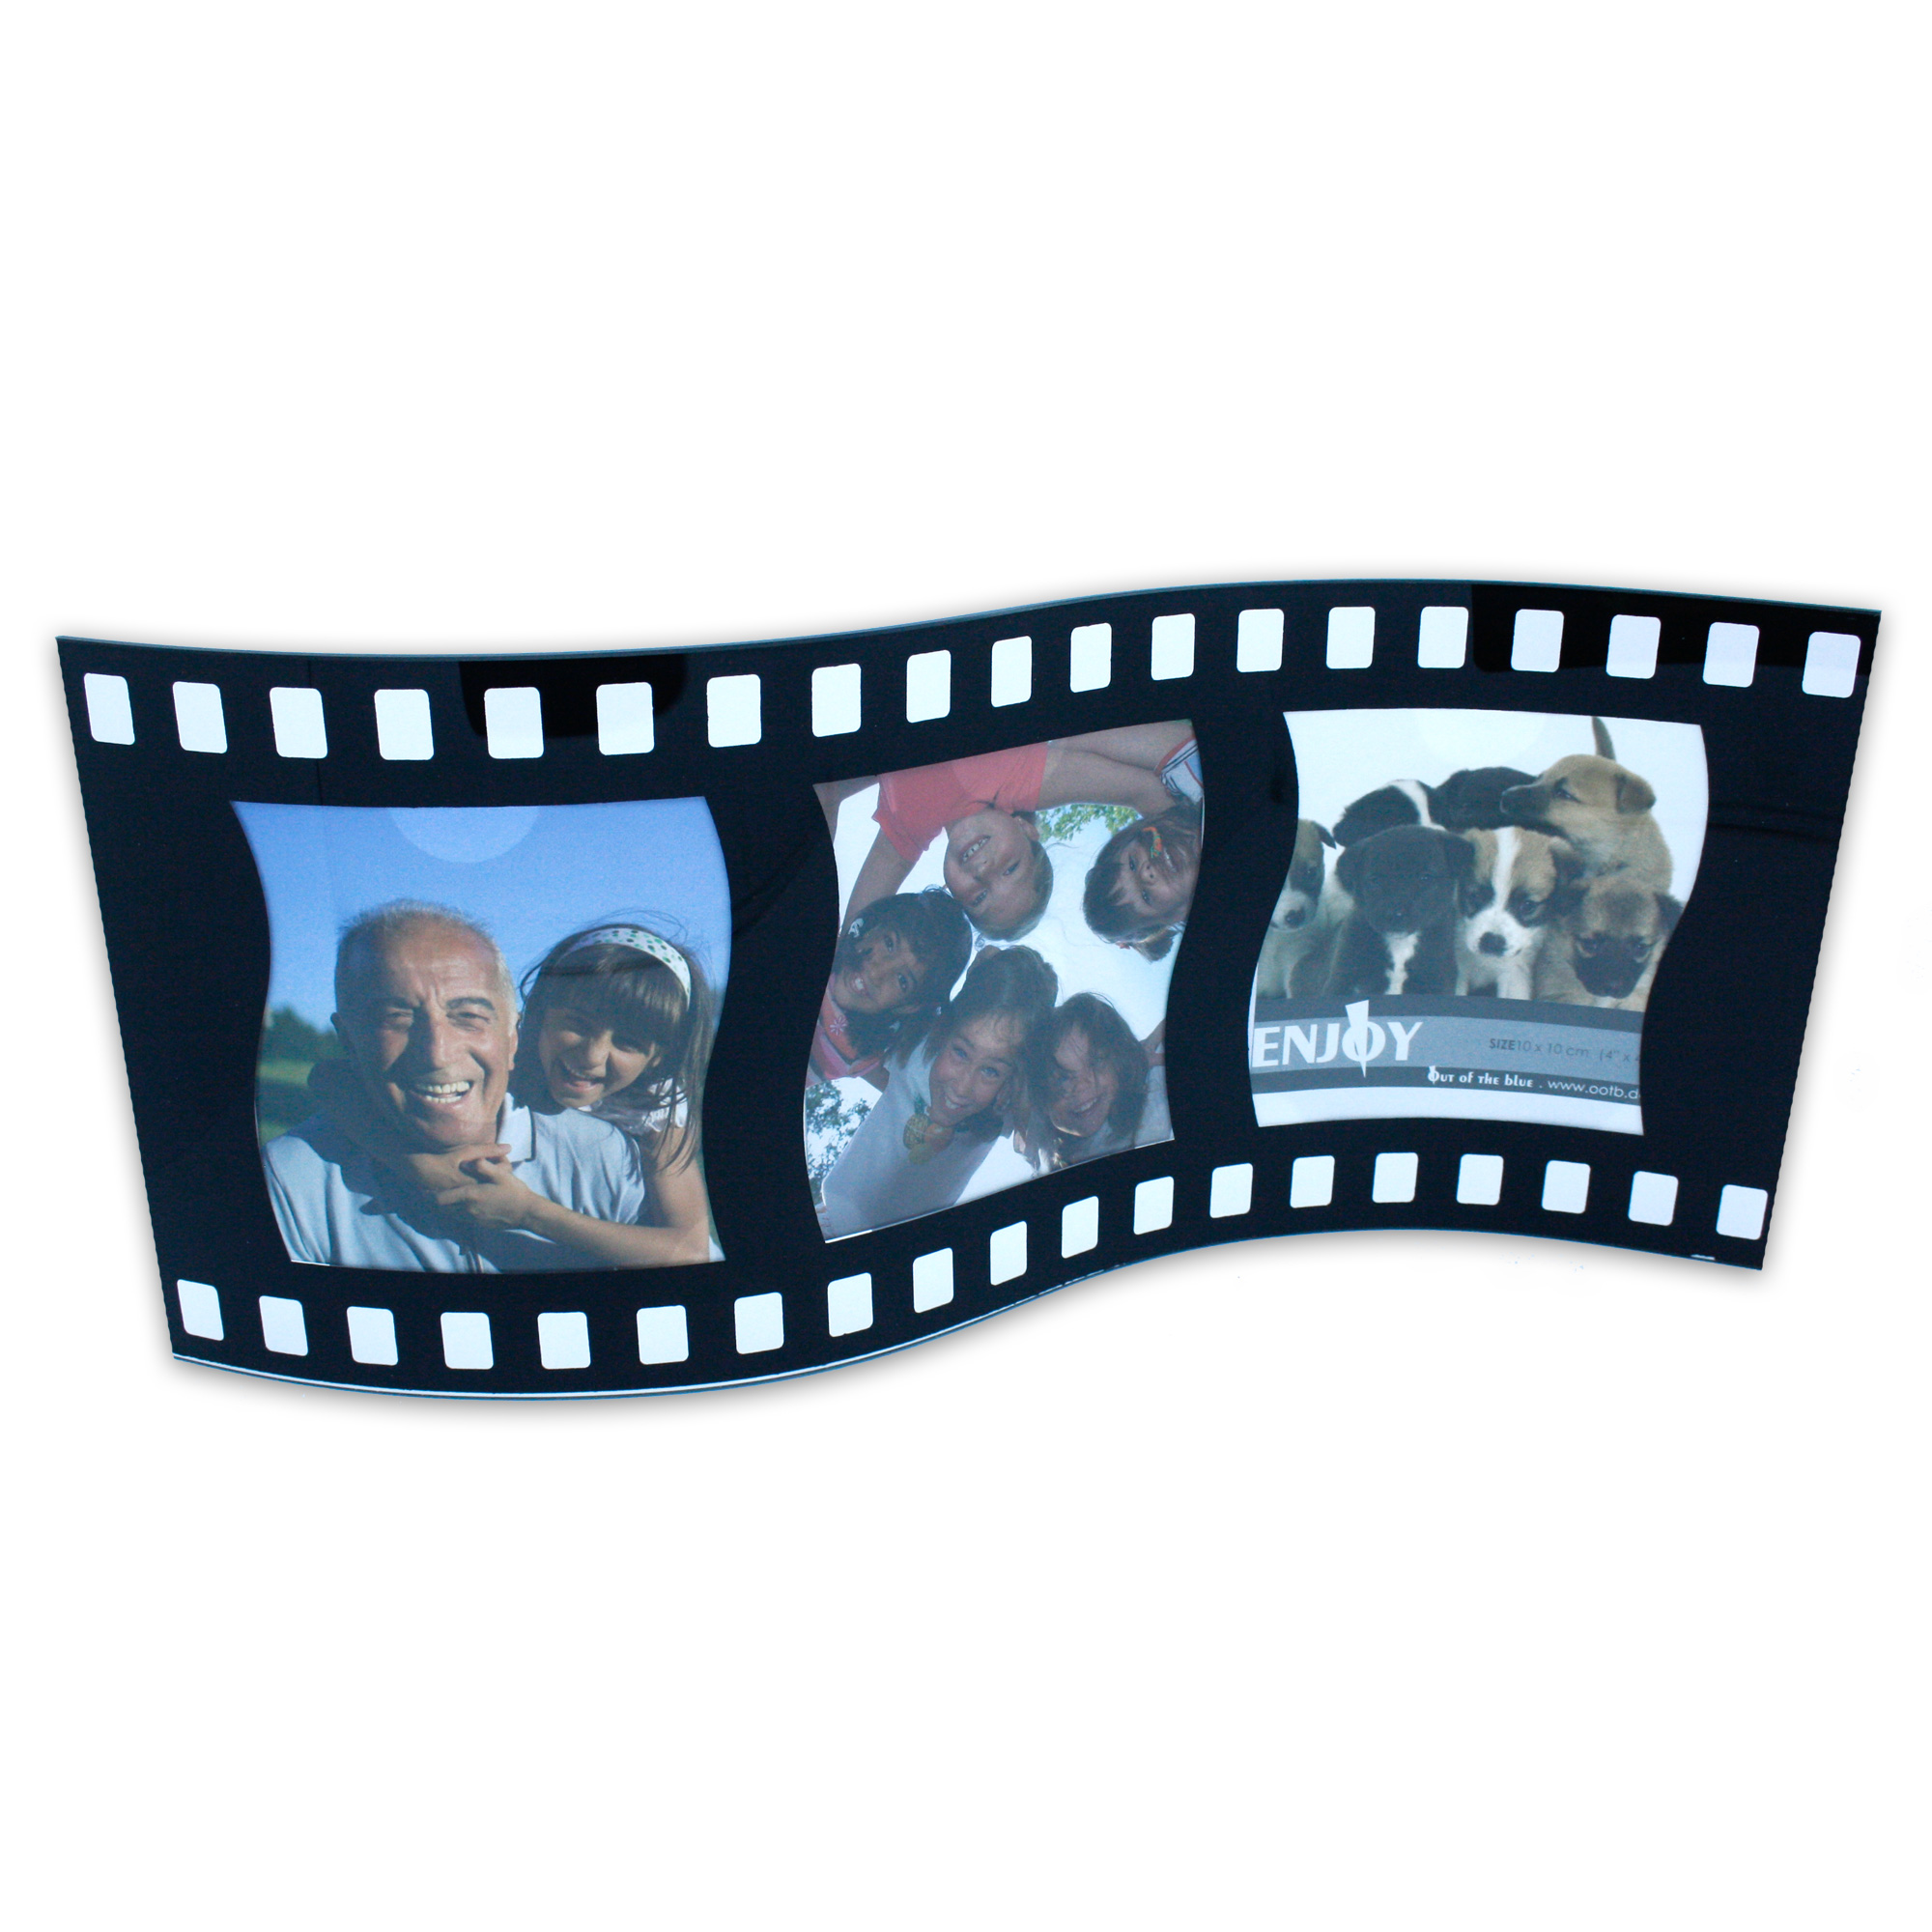 bilderrahmen aus glas in filmrollen optik f r 3 fotos 10 x 10 cm movie star. Black Bedroom Furniture Sets. Home Design Ideas